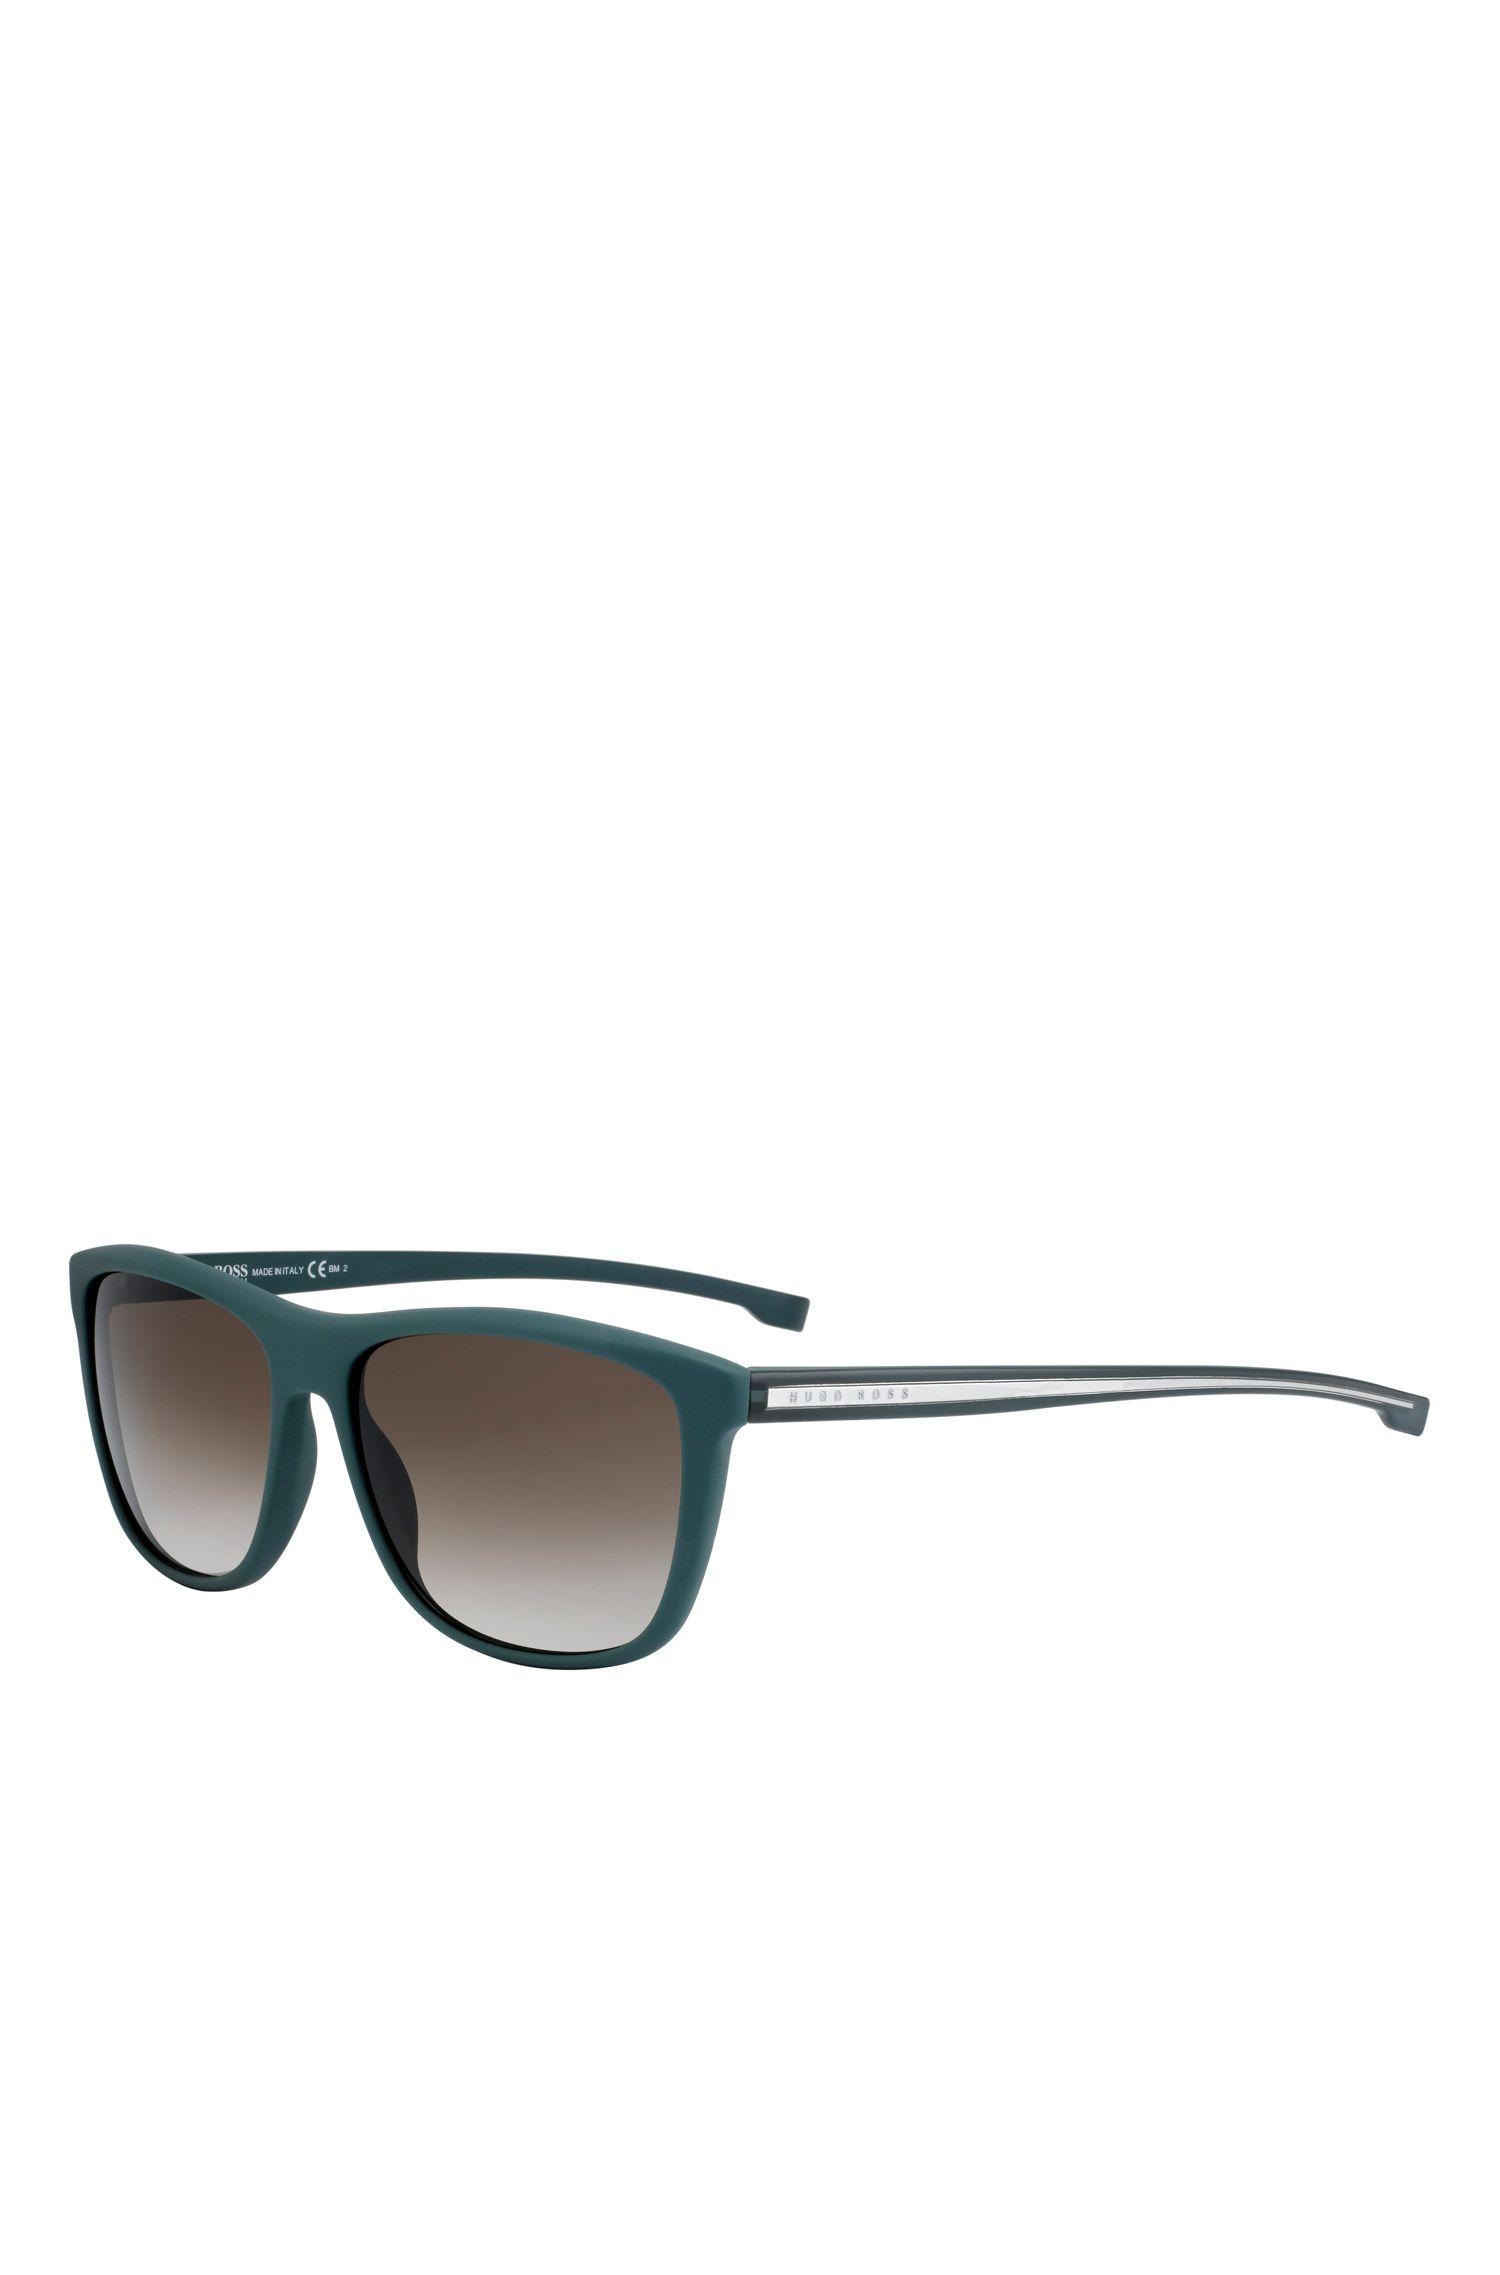 Gradient Lens Top Bar Sunglasses | BOSS 0874